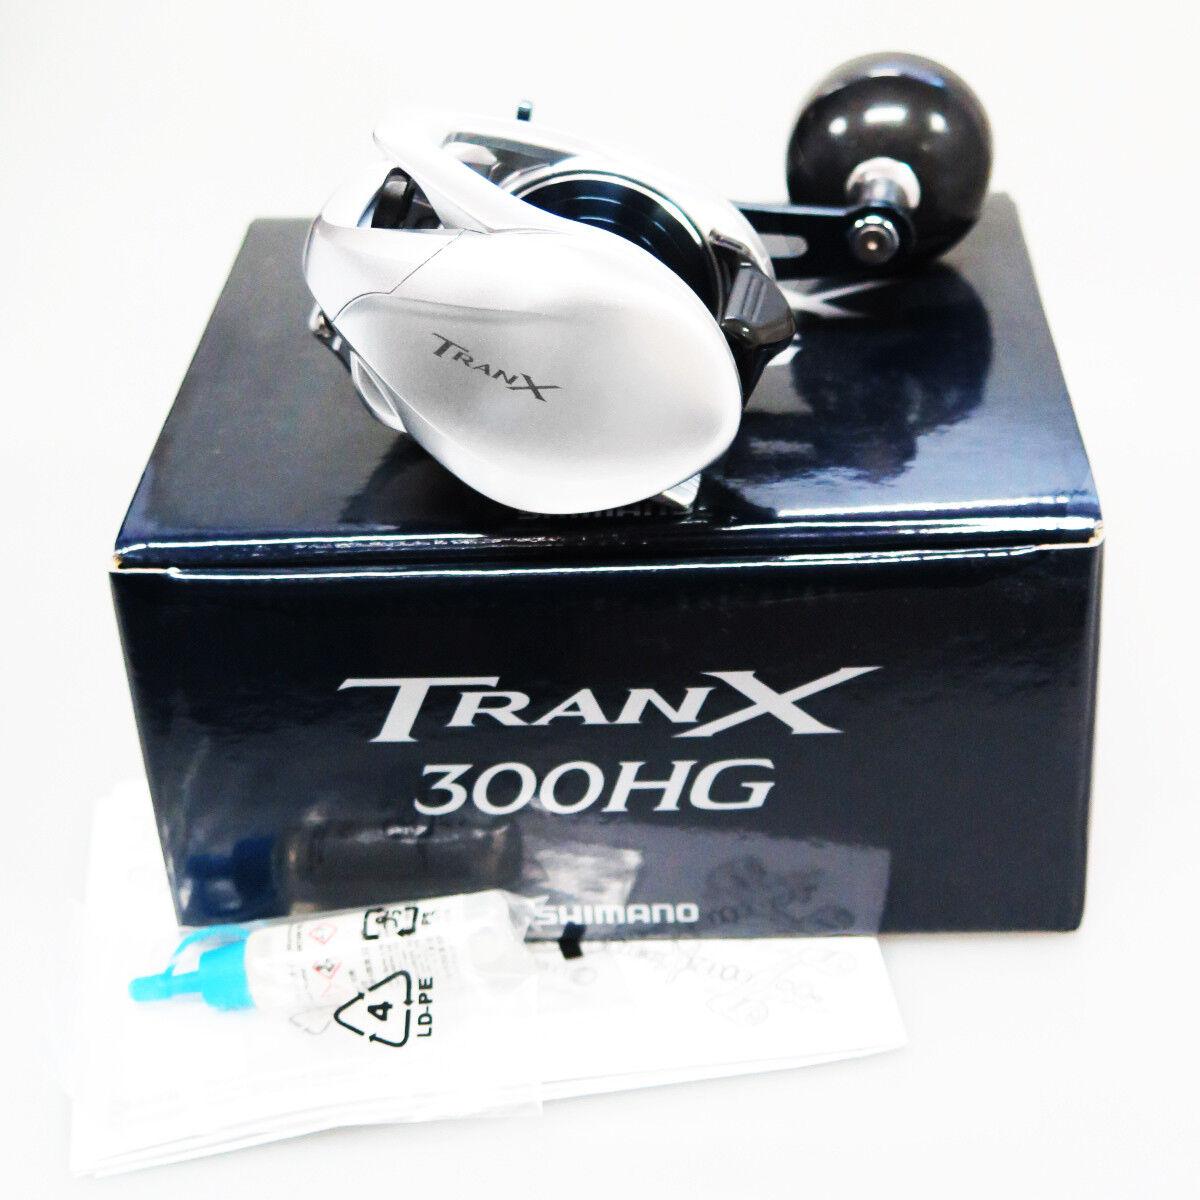 Cocherete Shimano TranX 300HG derecho 300 Hg TRX300AHG Prioridad FEDEX 2 días a usa